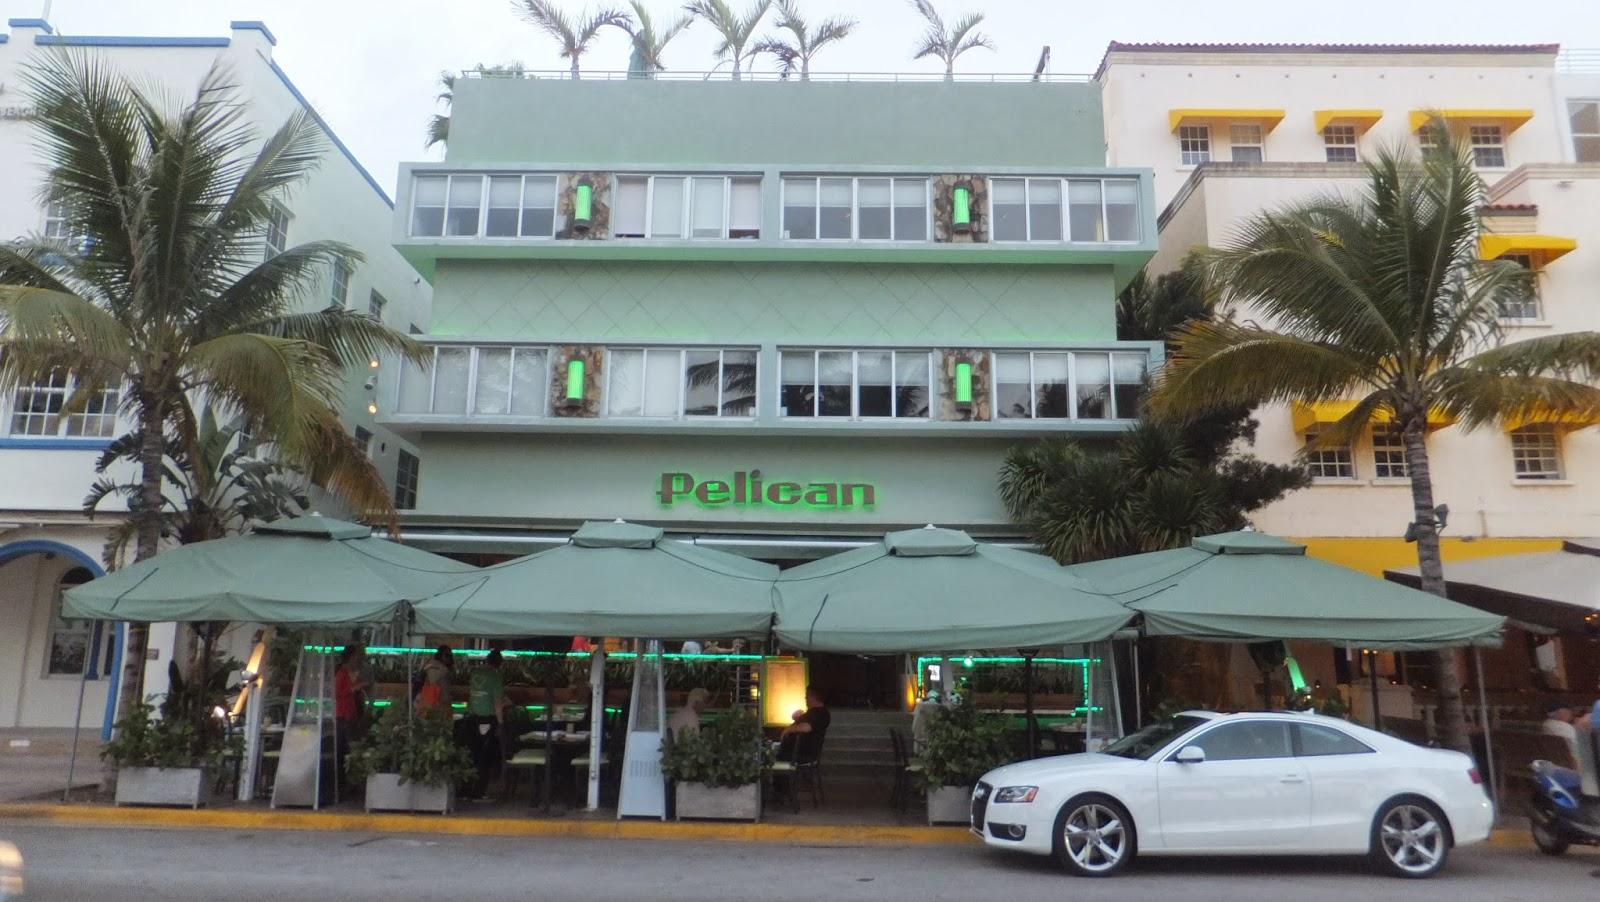 Pelican, Ocean Drive, Miami Beach, SoBe, Florida, Elisa N, Blog de Viajes, Lifestyle, Travel